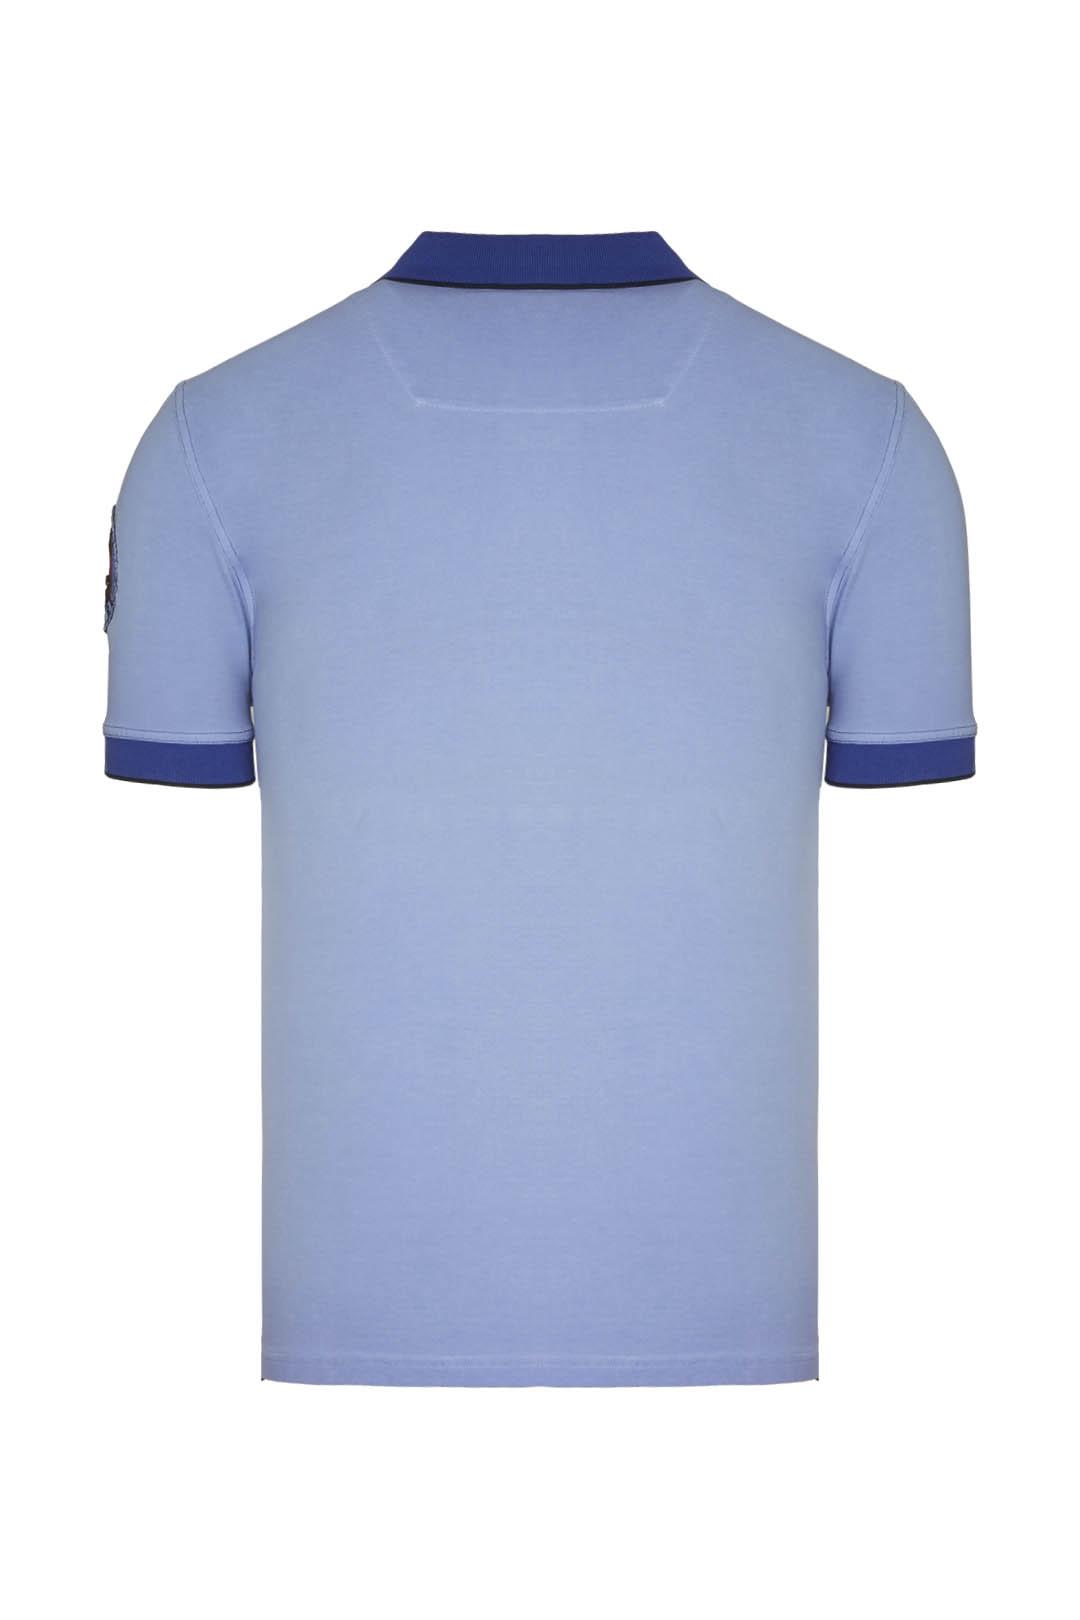 102°Gruppo Poloshirt mit Kontrastdetails 2